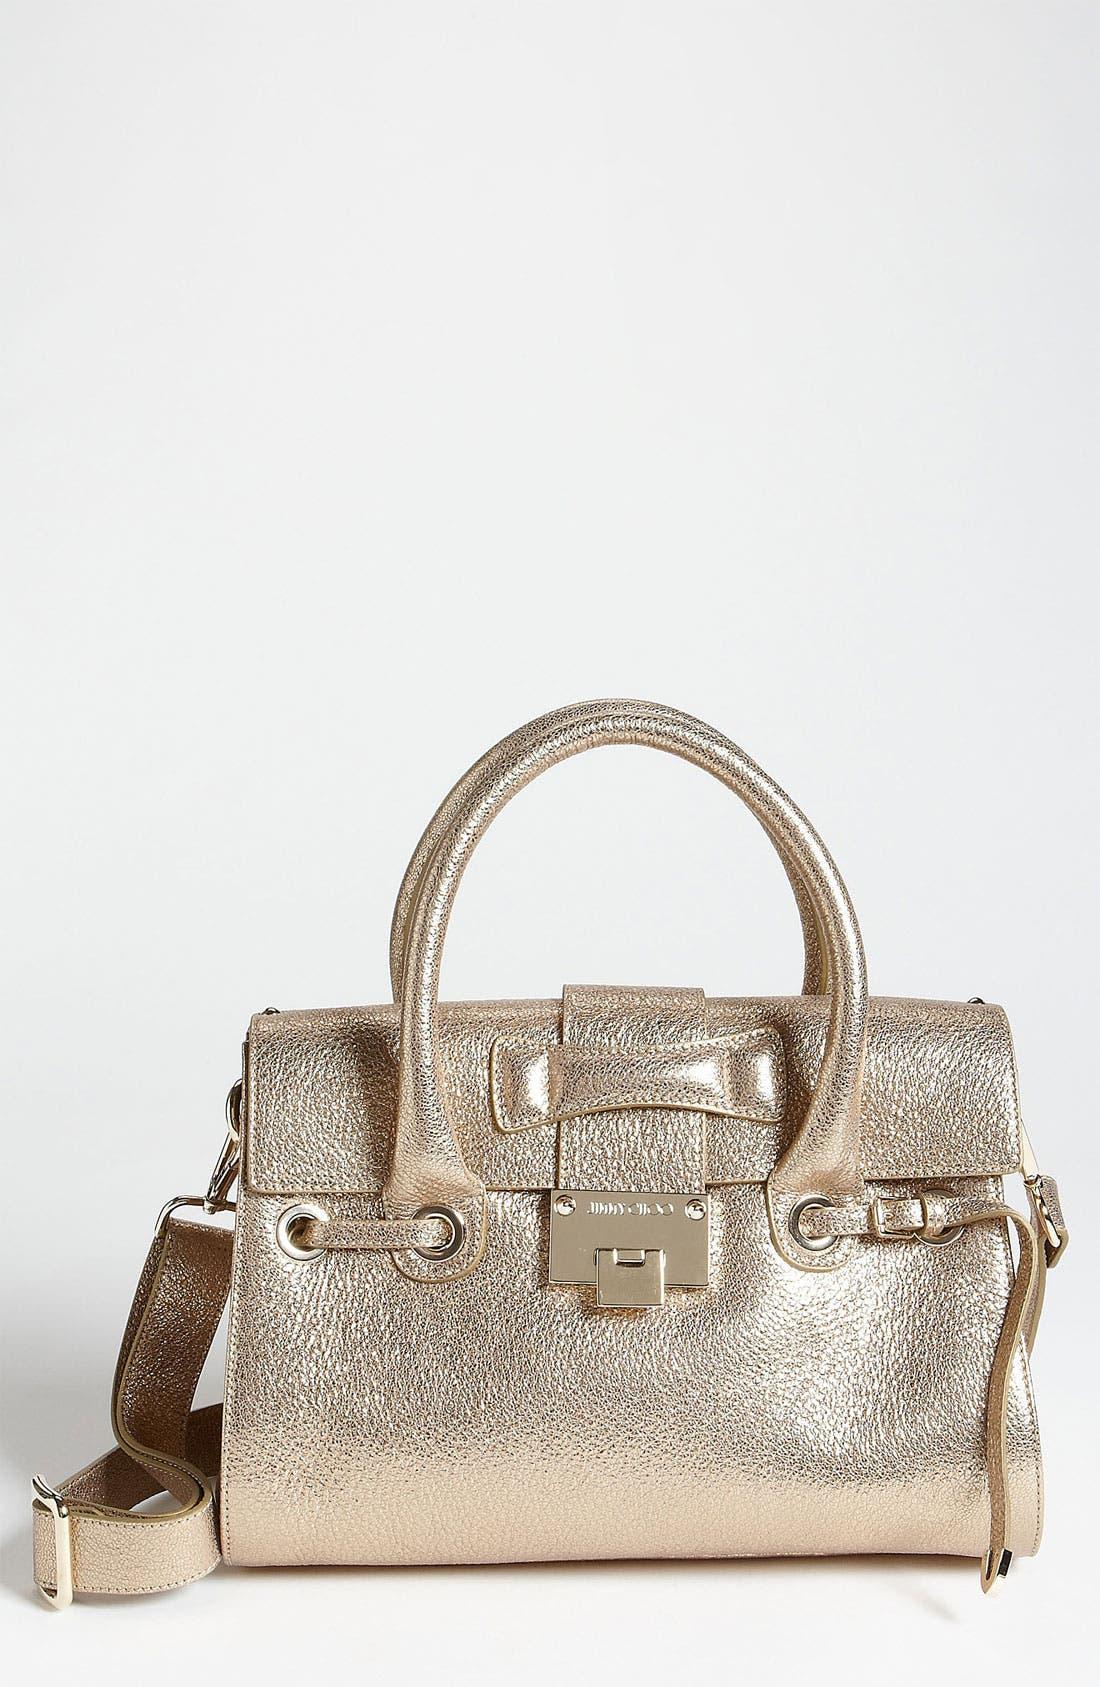 Main Image - Jimmy Choo 'Rosalie' Glitter Leather Satchel